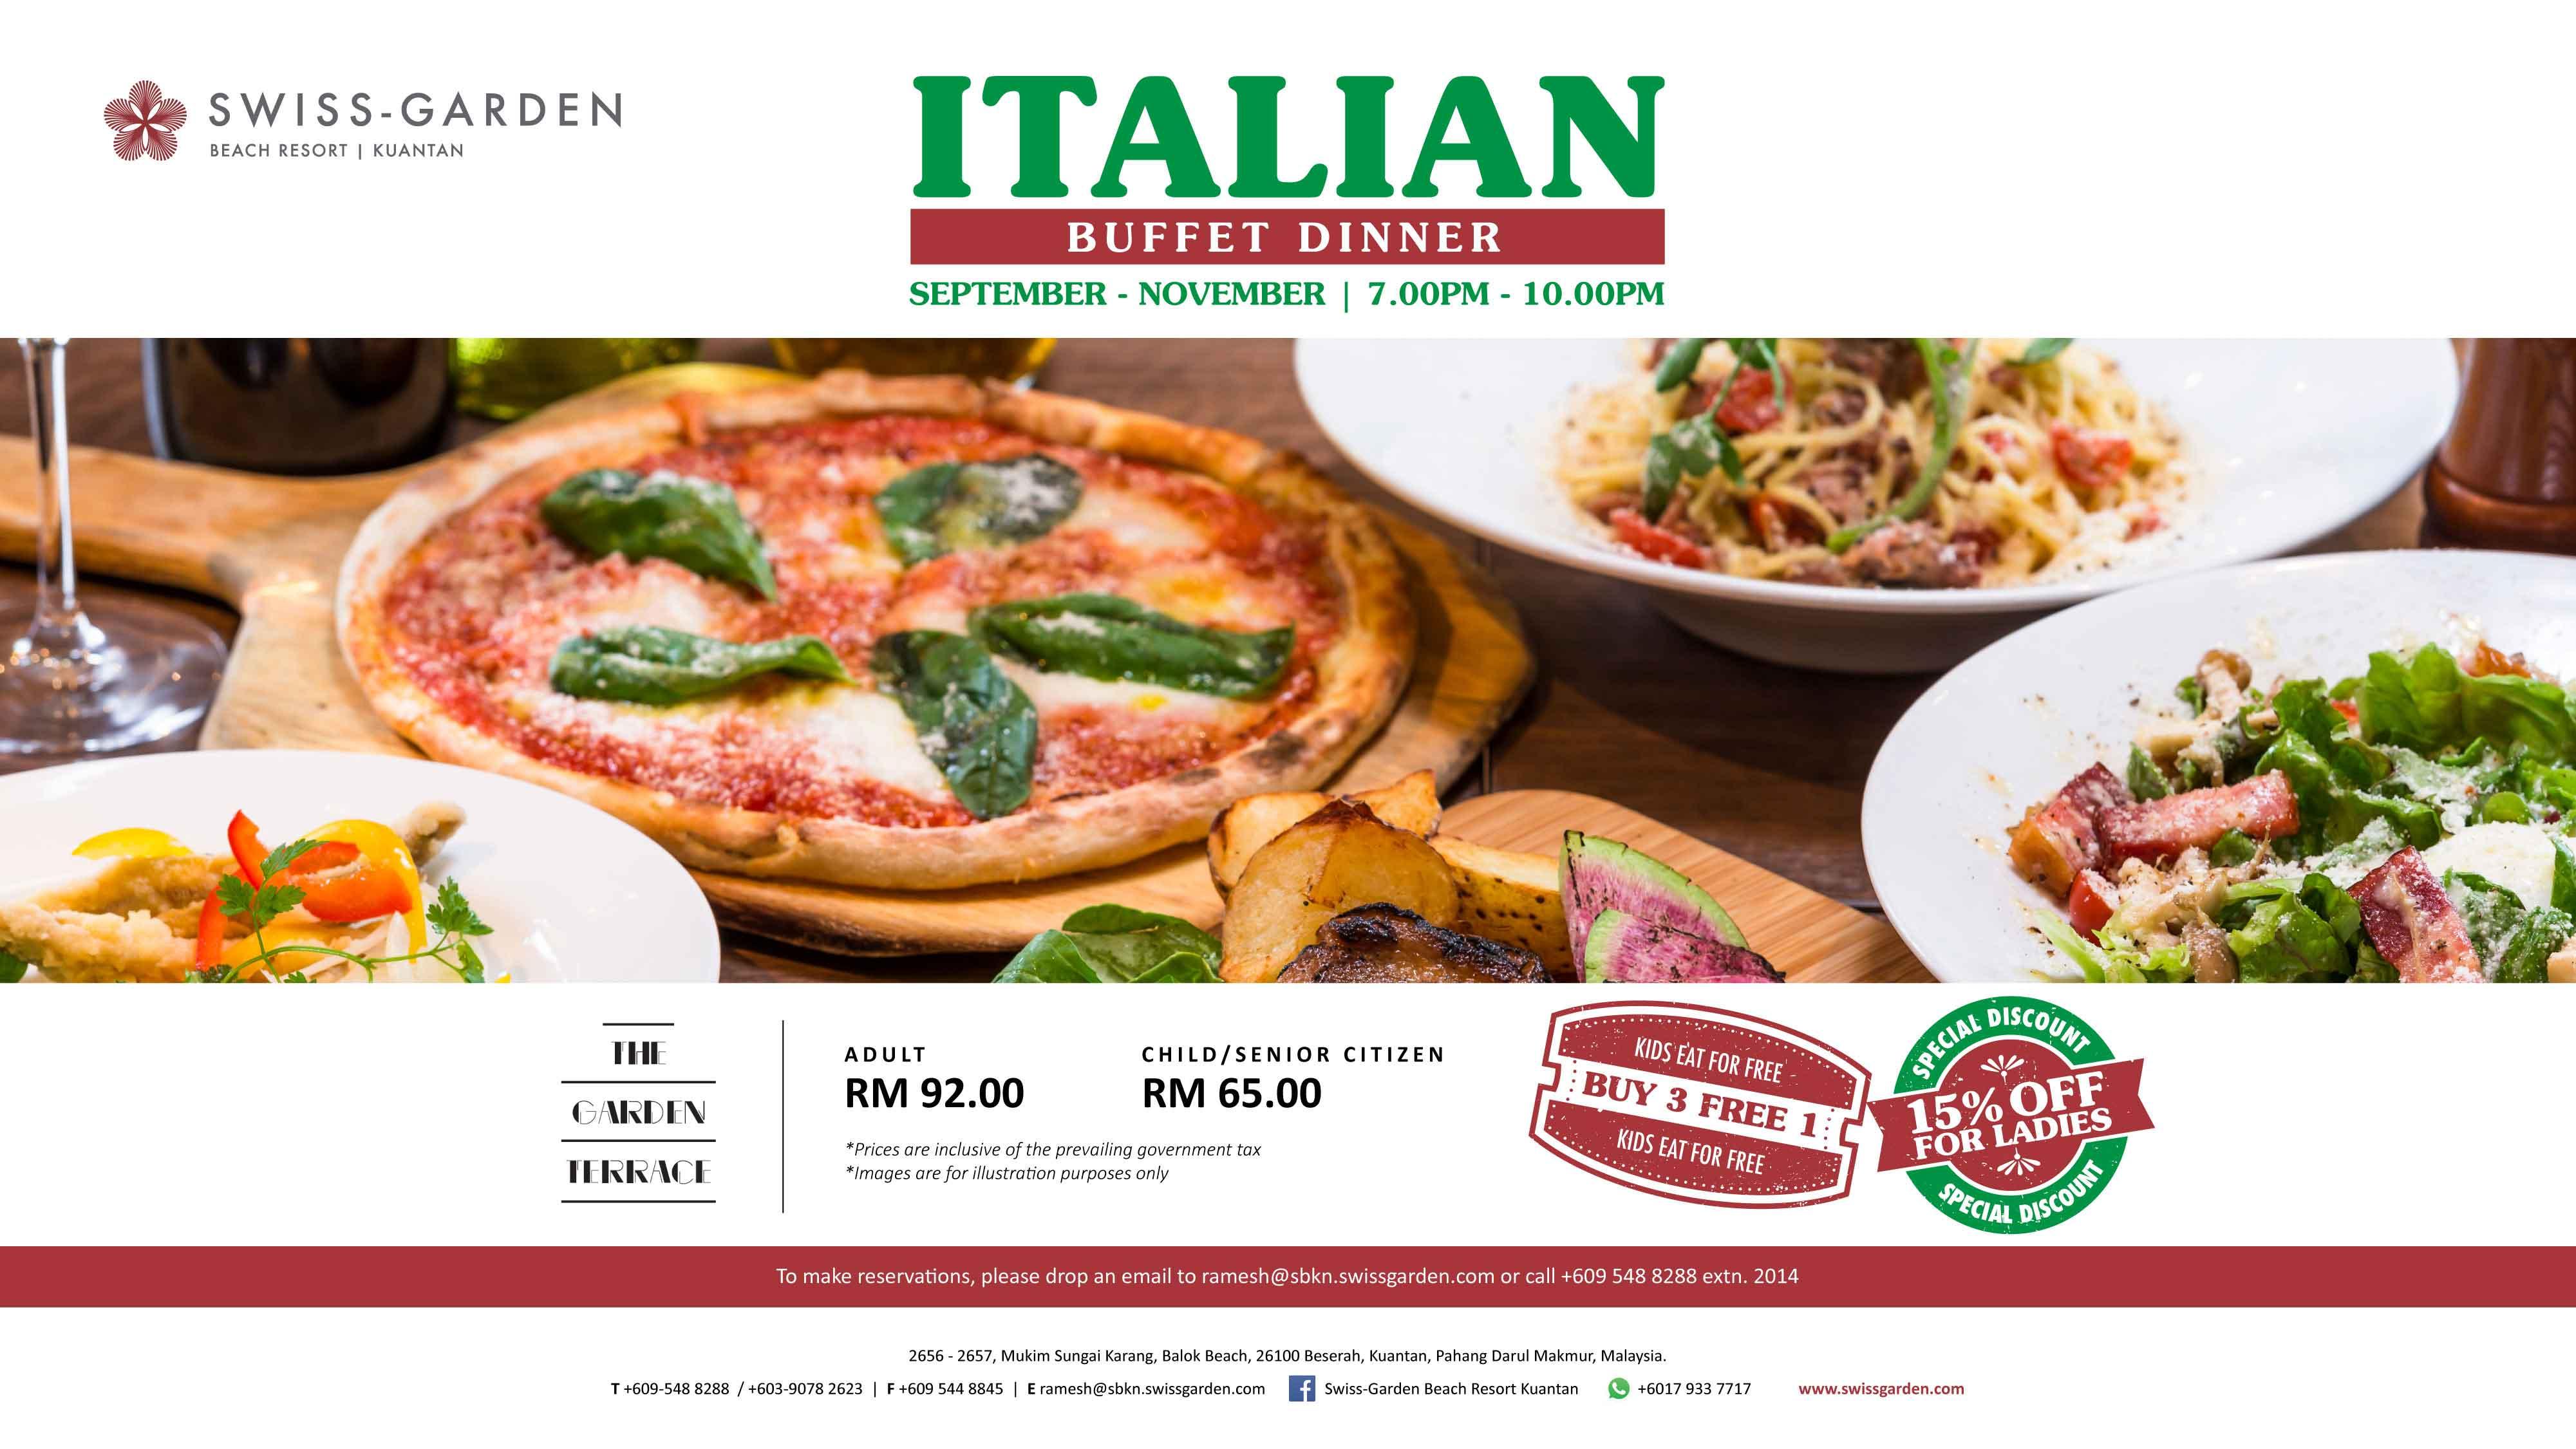 Italian buffet dinner promotion